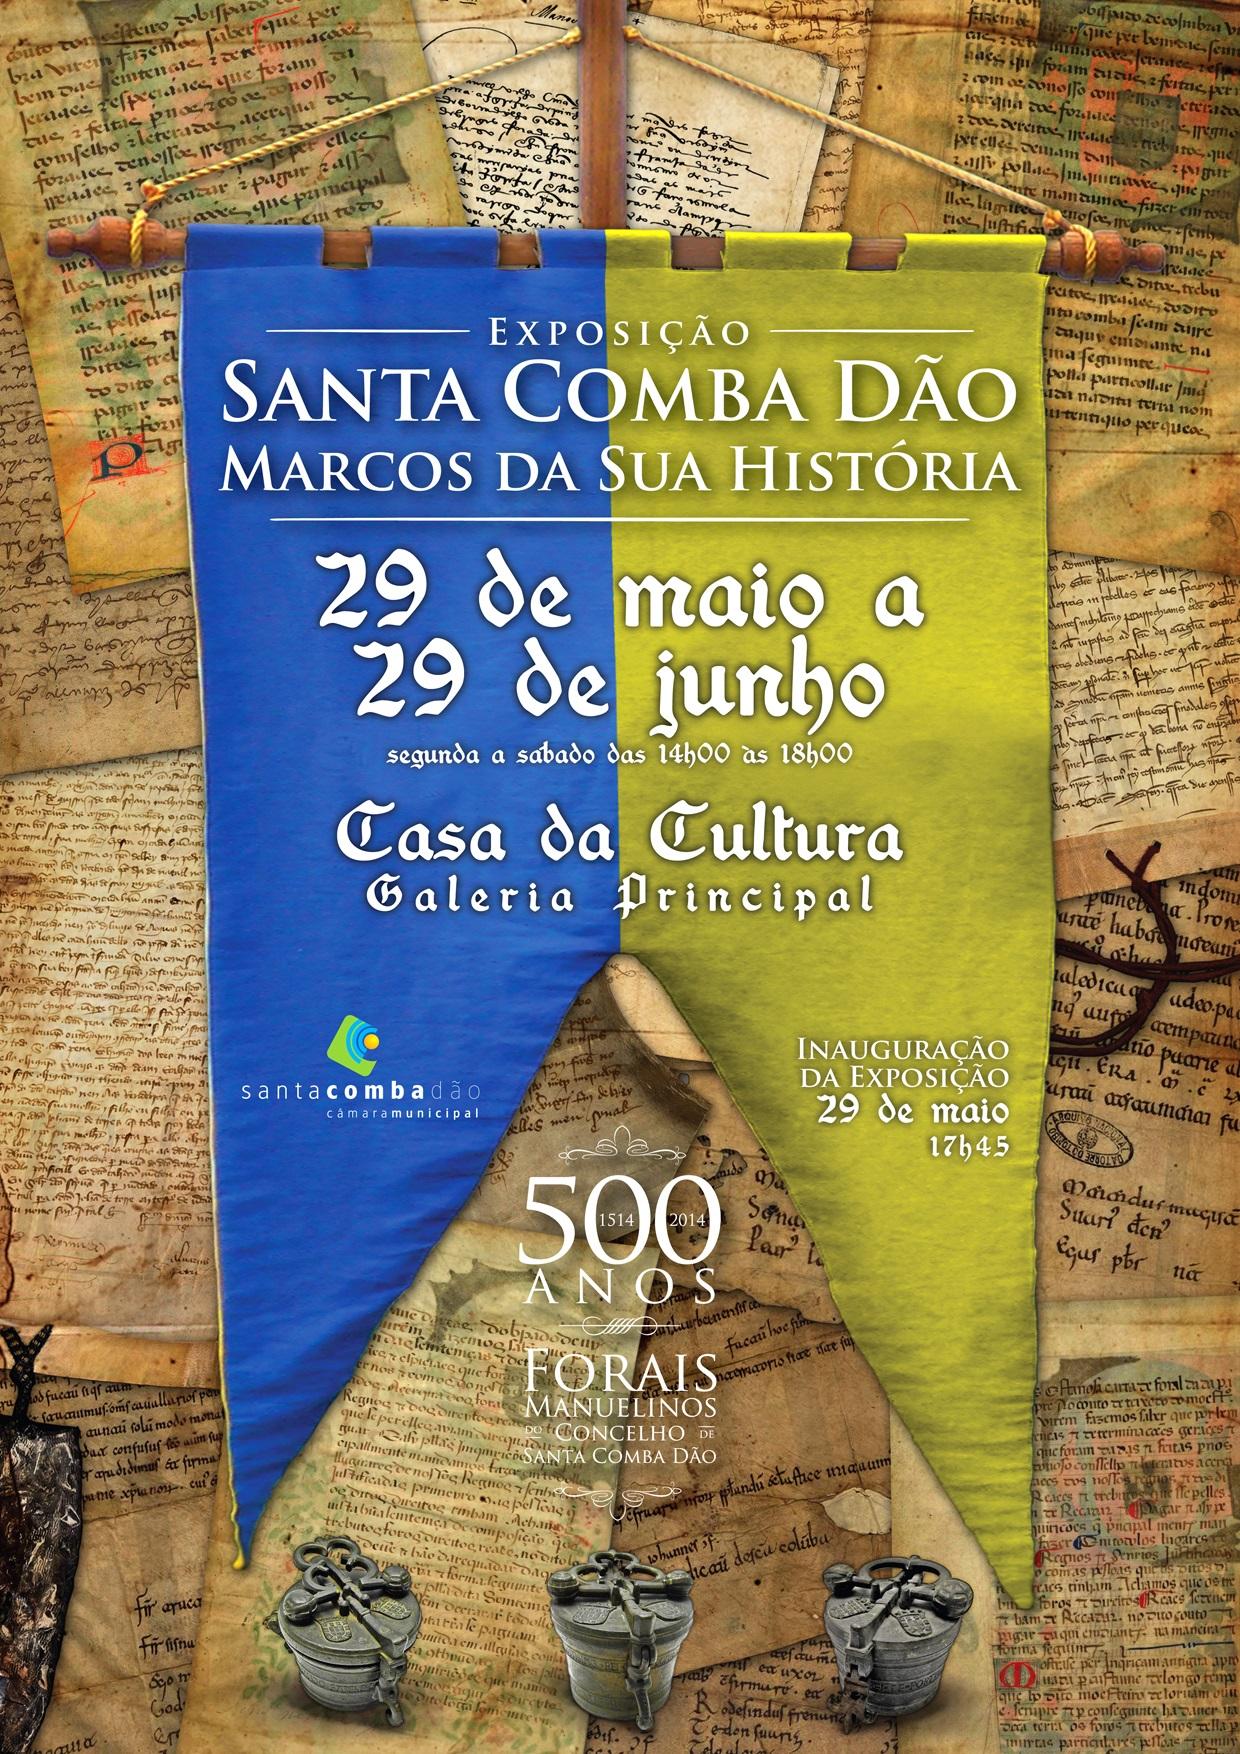 http://valemartinho.pt/wp-content/uploads/2014/05/cartaz_exposicao_web.jpg